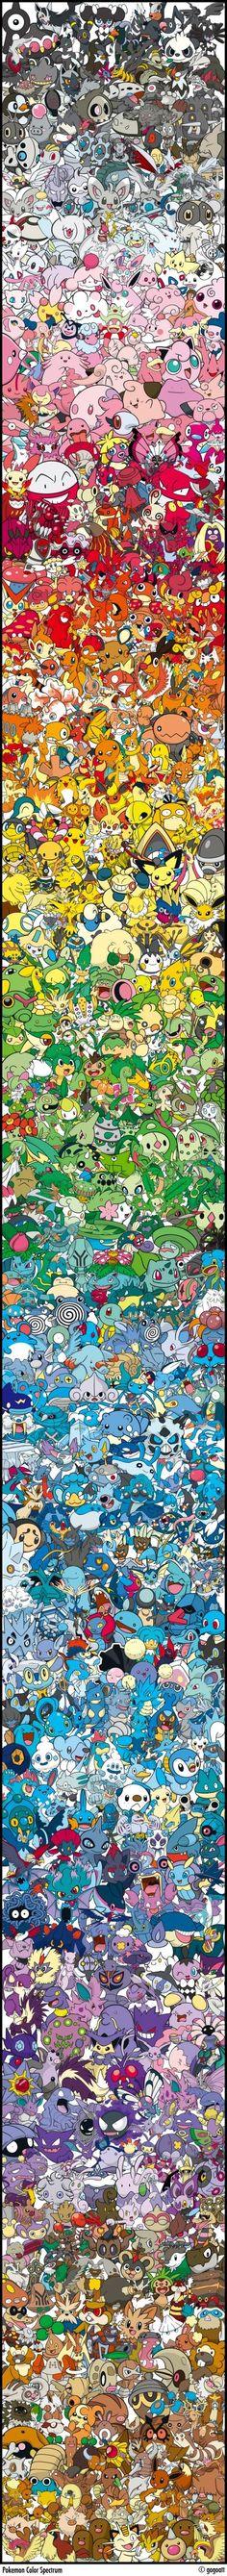 Pokemon Color Spectrum by gogoatt via Imgur: Is everyone there? #Illustration #Pokemon